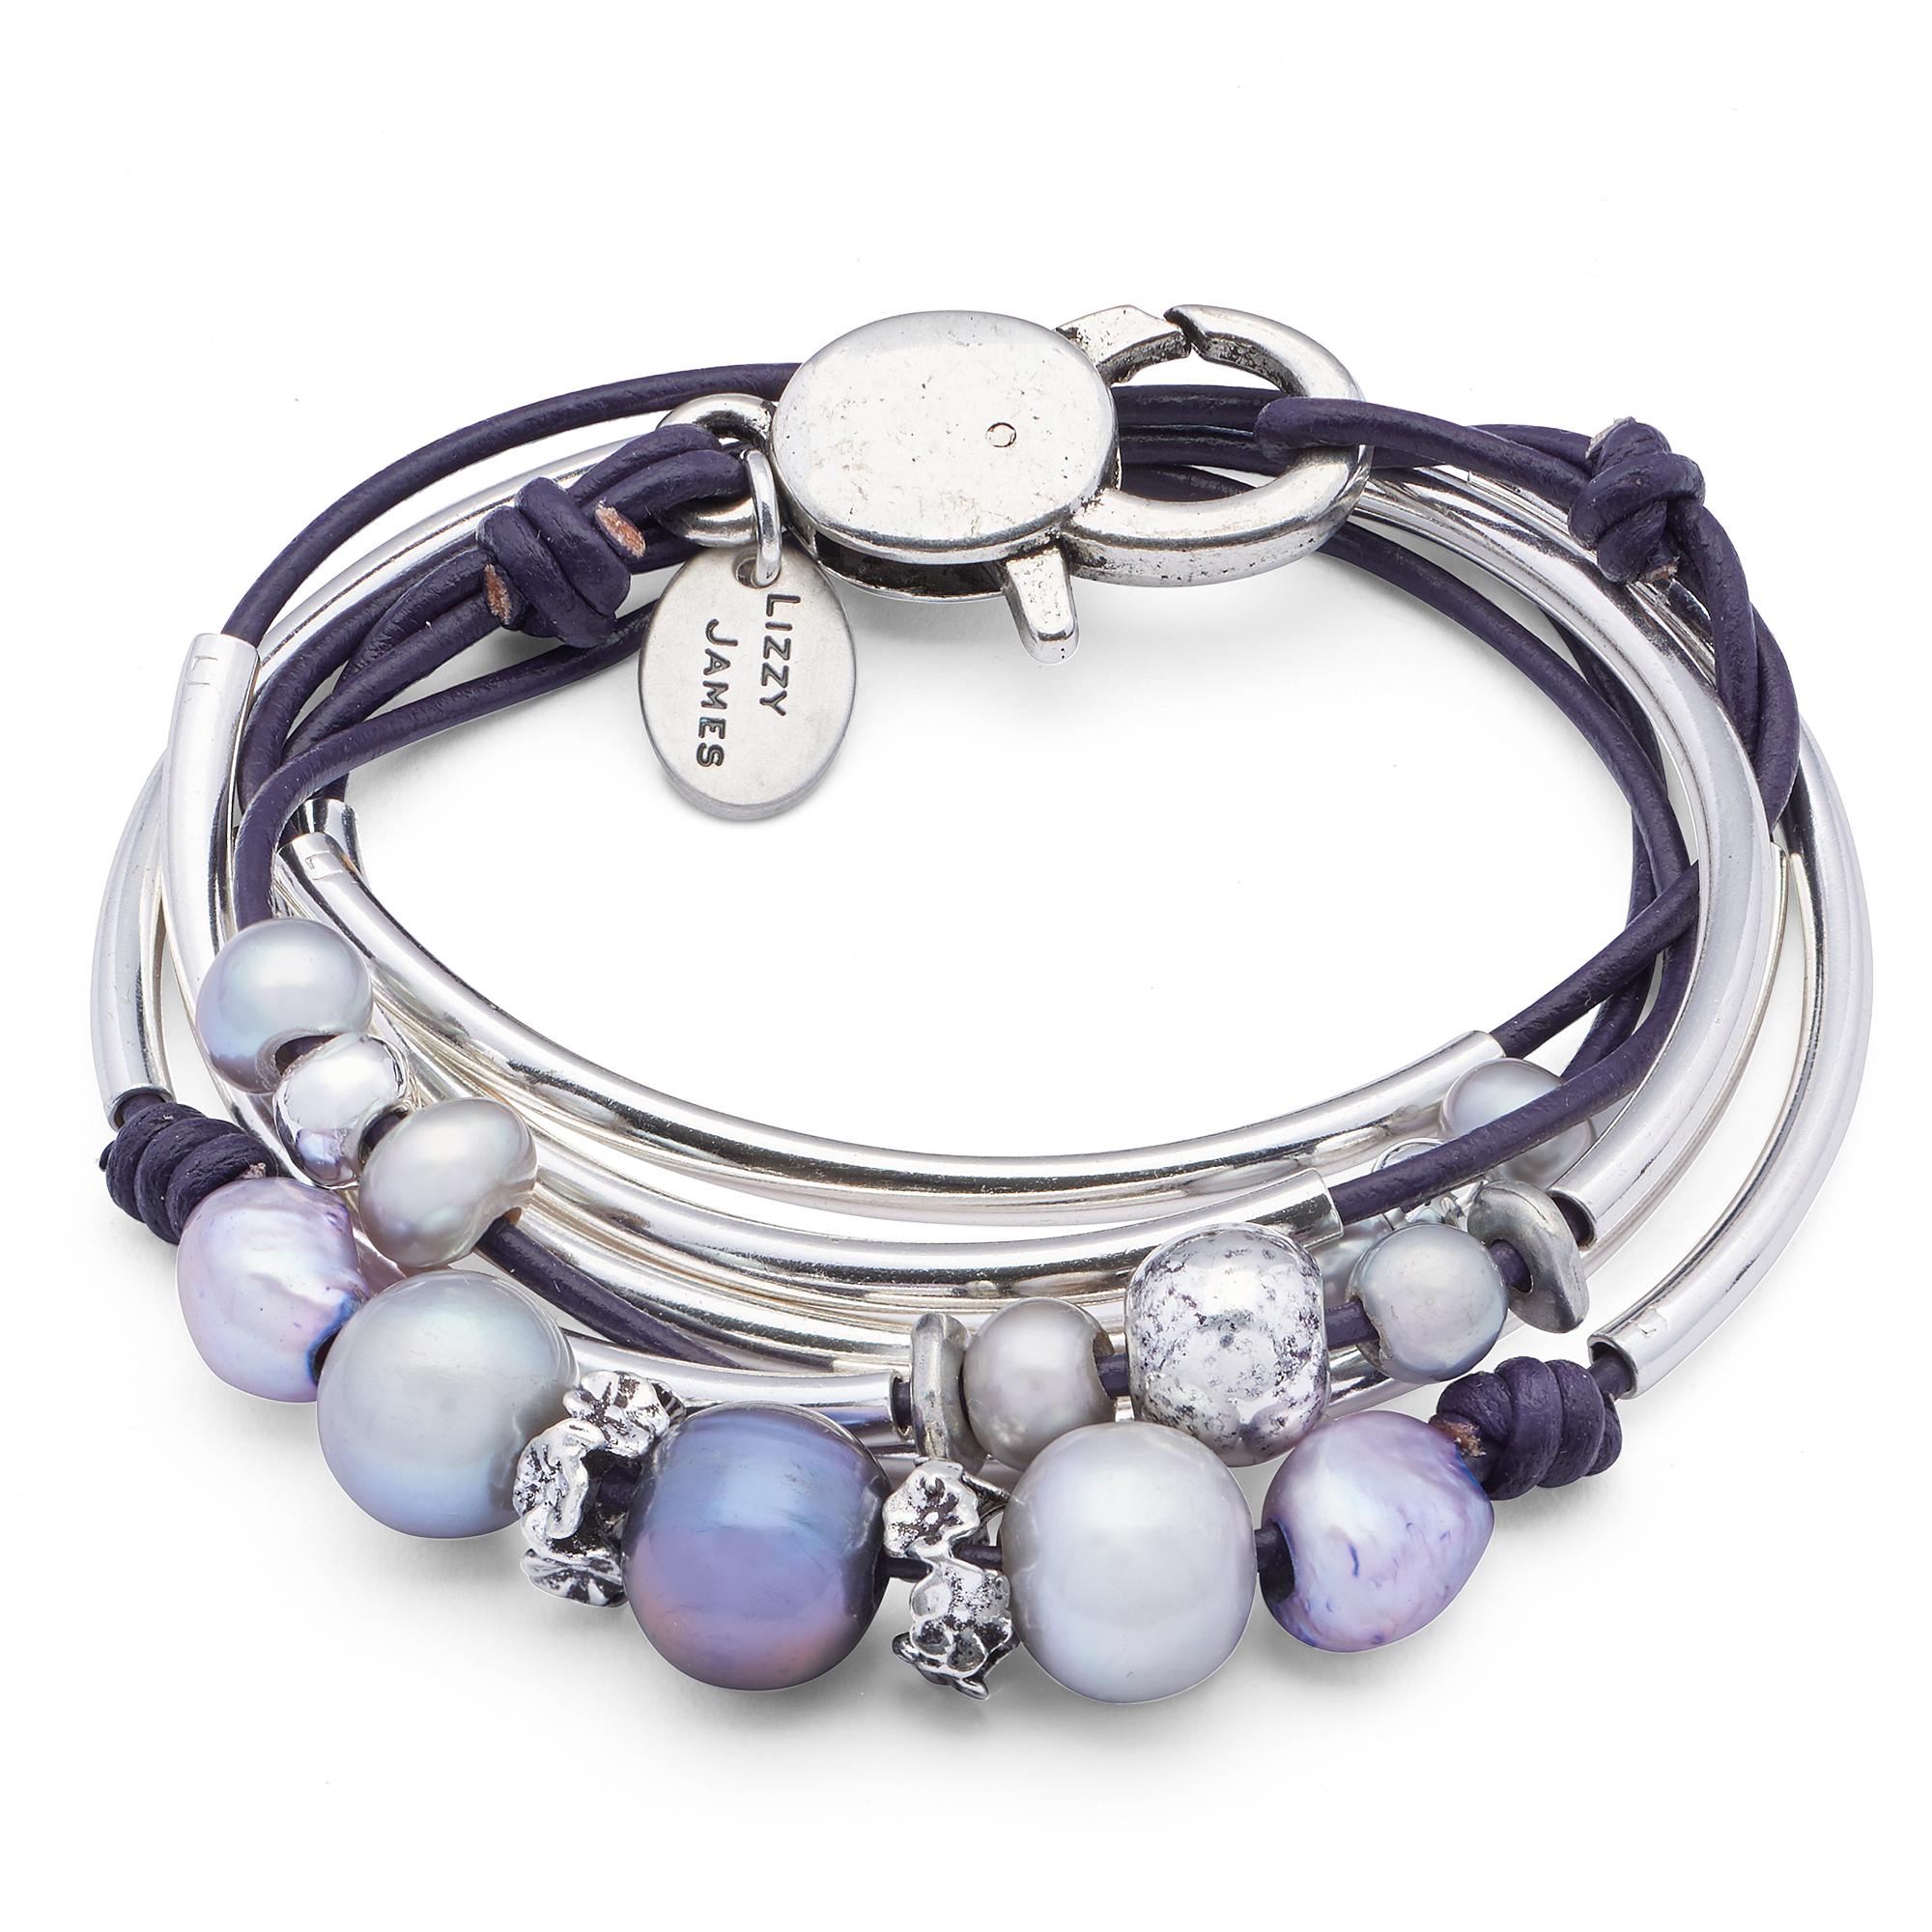 The Prudence  wrap bracelet shown above.